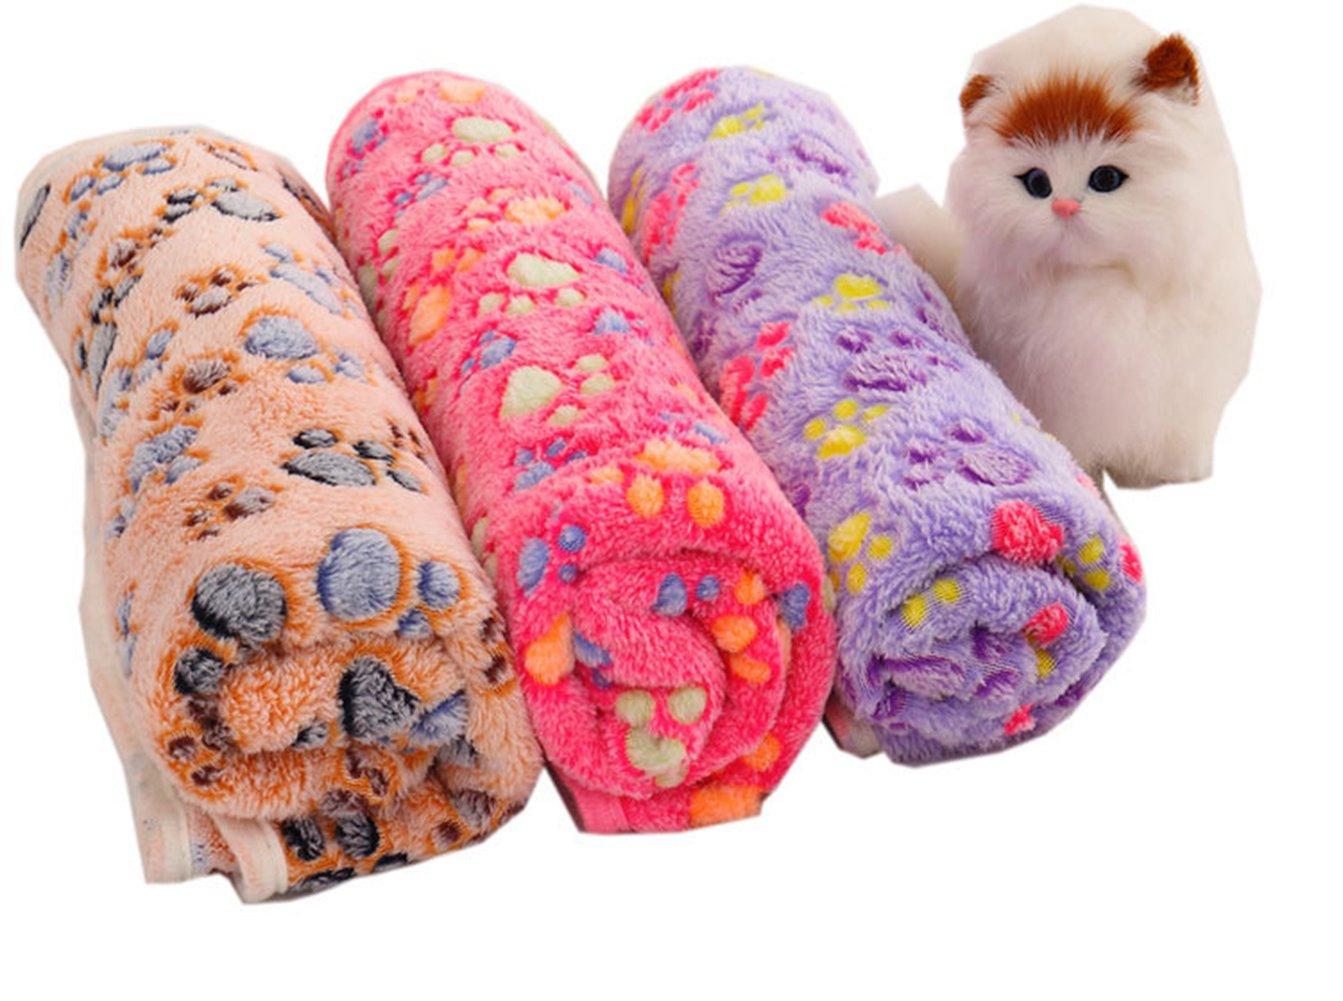 /Manta sof/á Cama Pet Calientes del coj/ín Protectora Toalla 20/* 20/cm Haodou Mascotas Matte Suave Forro Polar Paw Print Dise/ño Pet Puppy Perros y Gatos Matte/